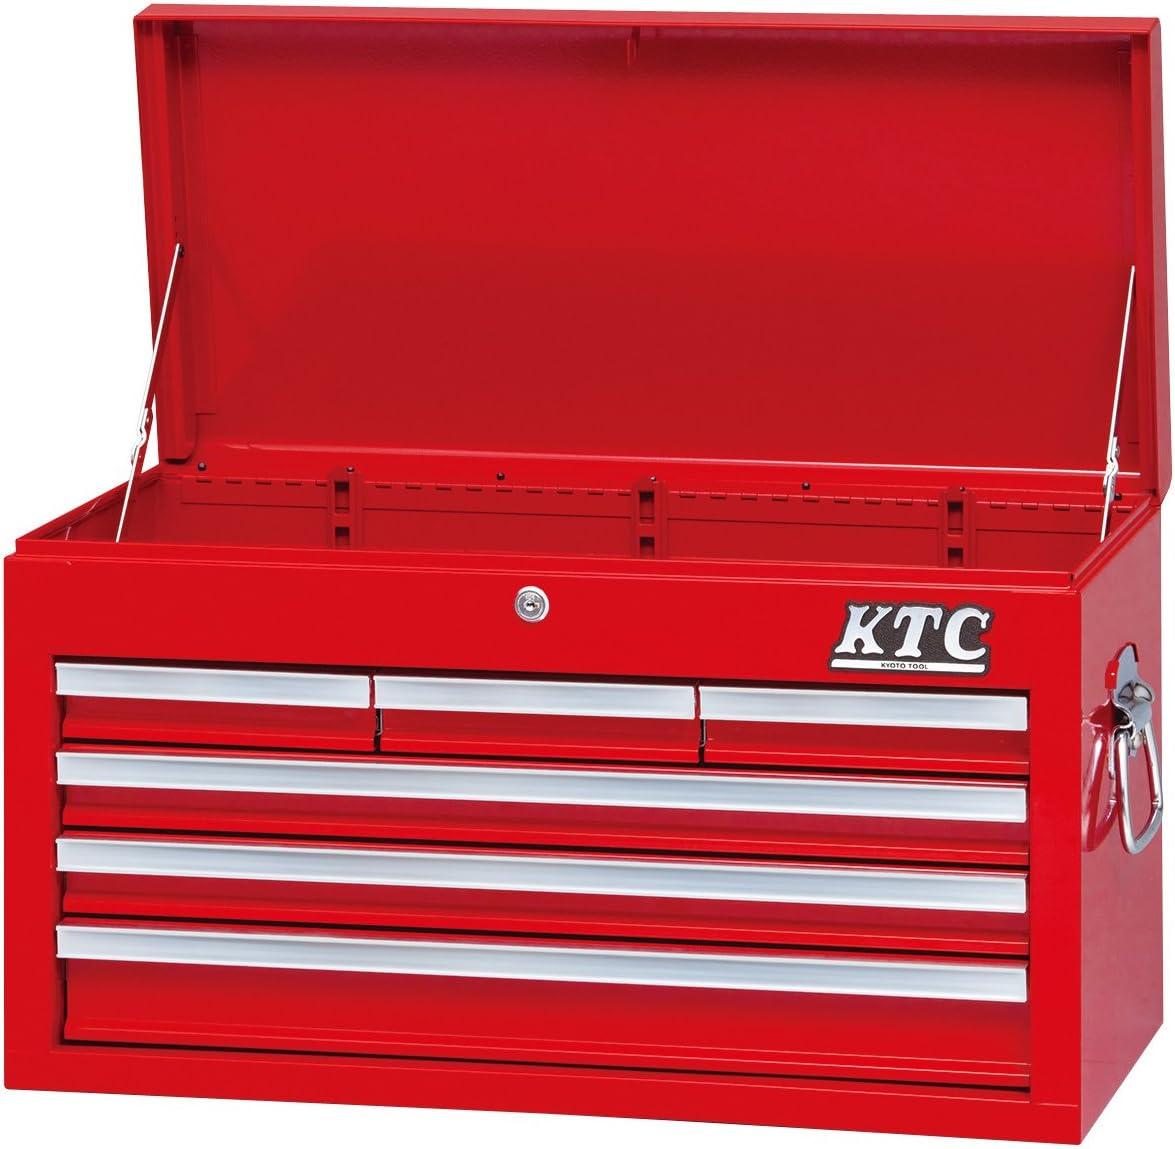 KTC(ケーテーシー) チェスト 4段6引き出し SKX3306